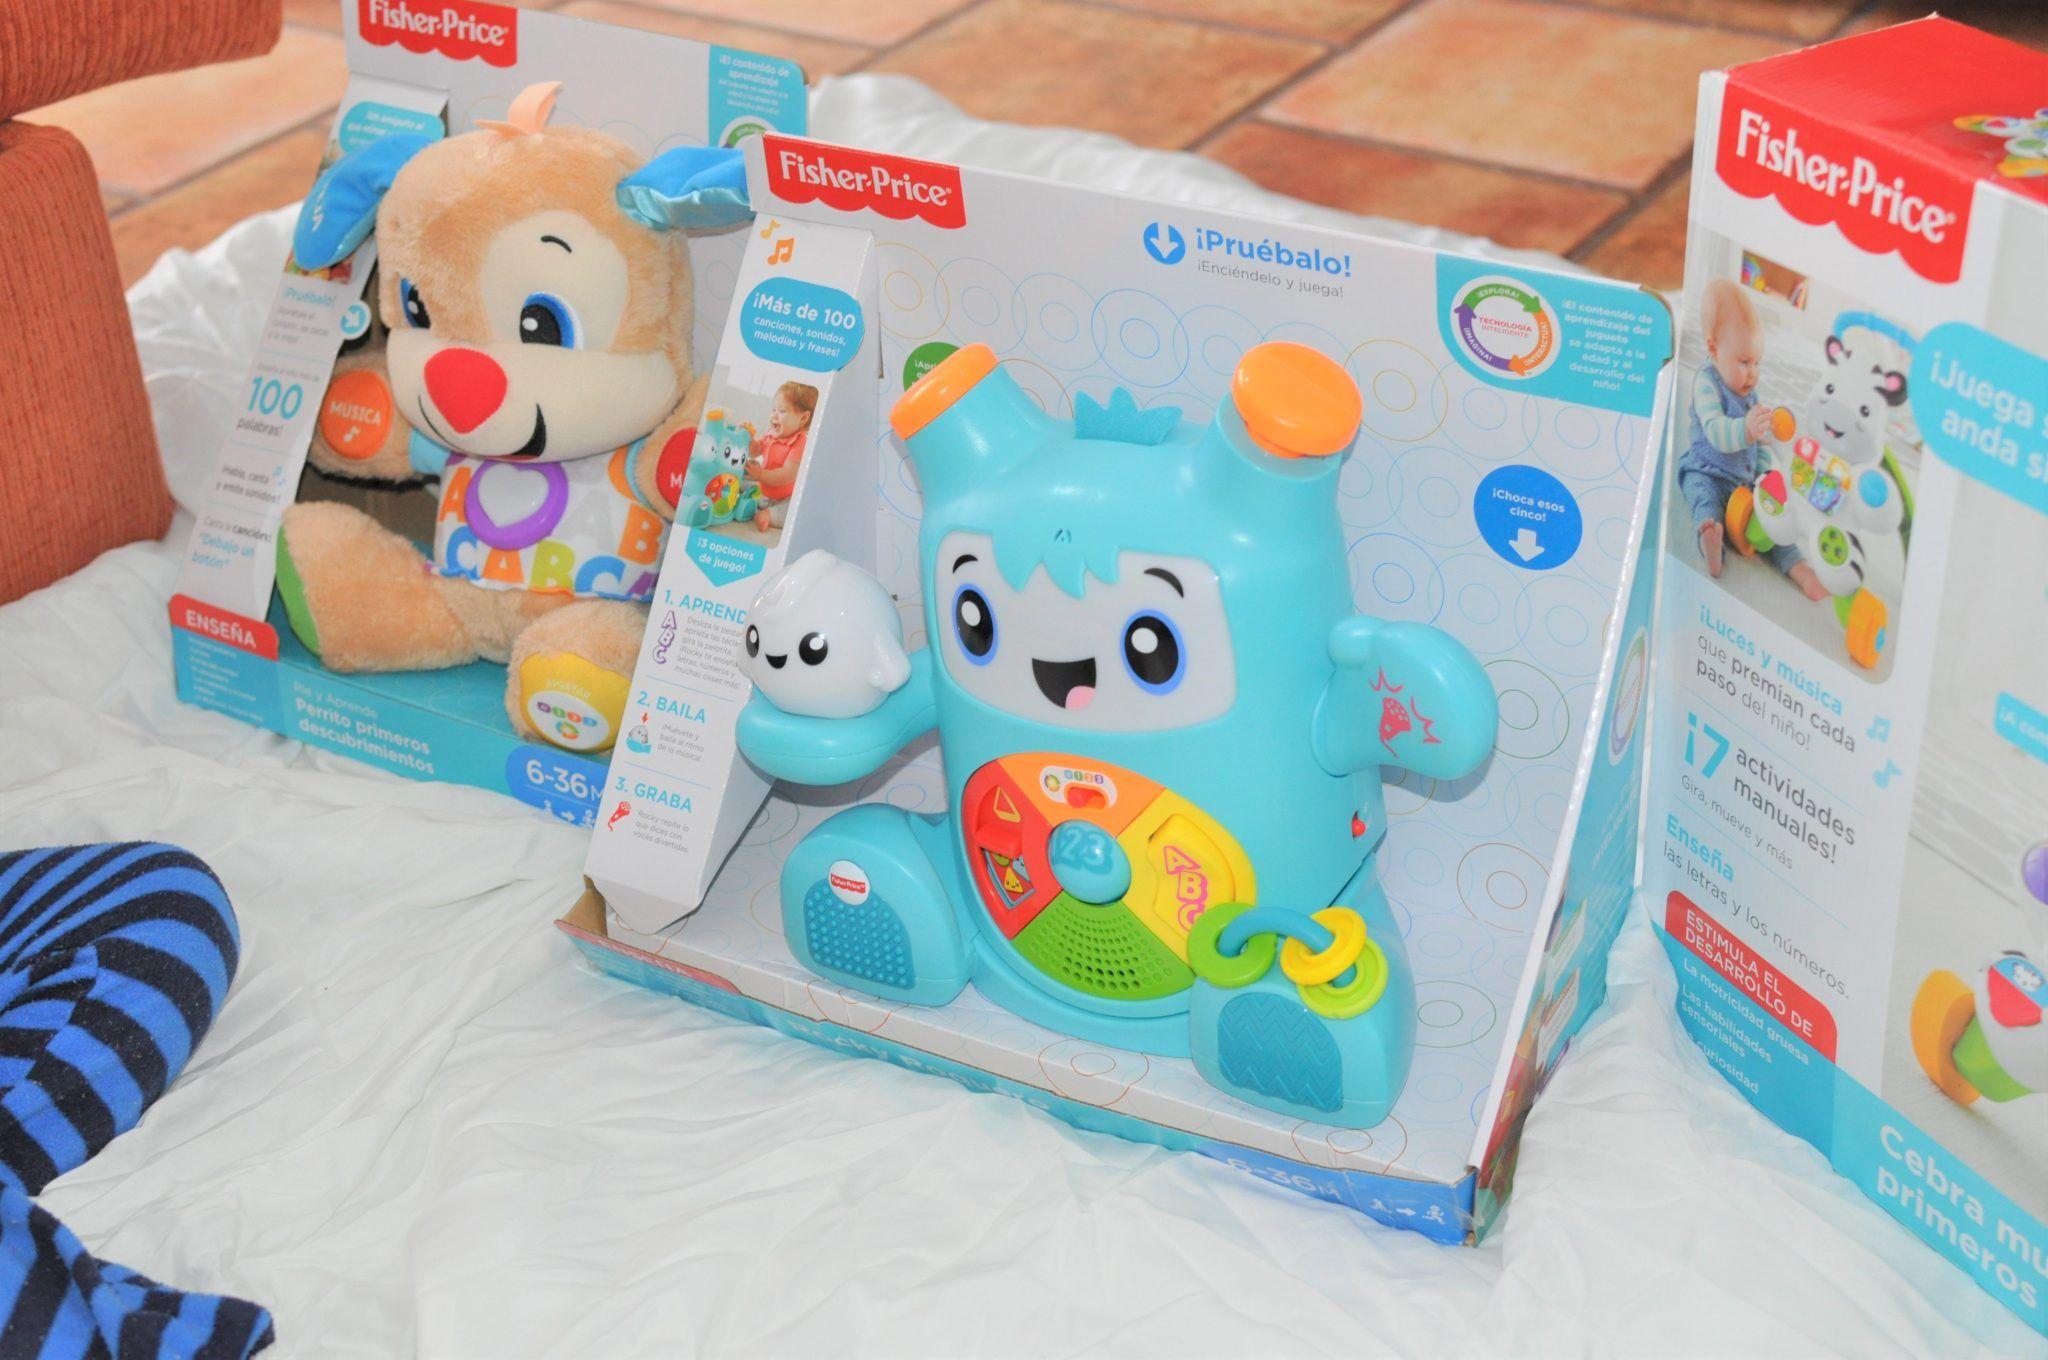 Probamos juguetes Fisher Price, aprender y divertirse